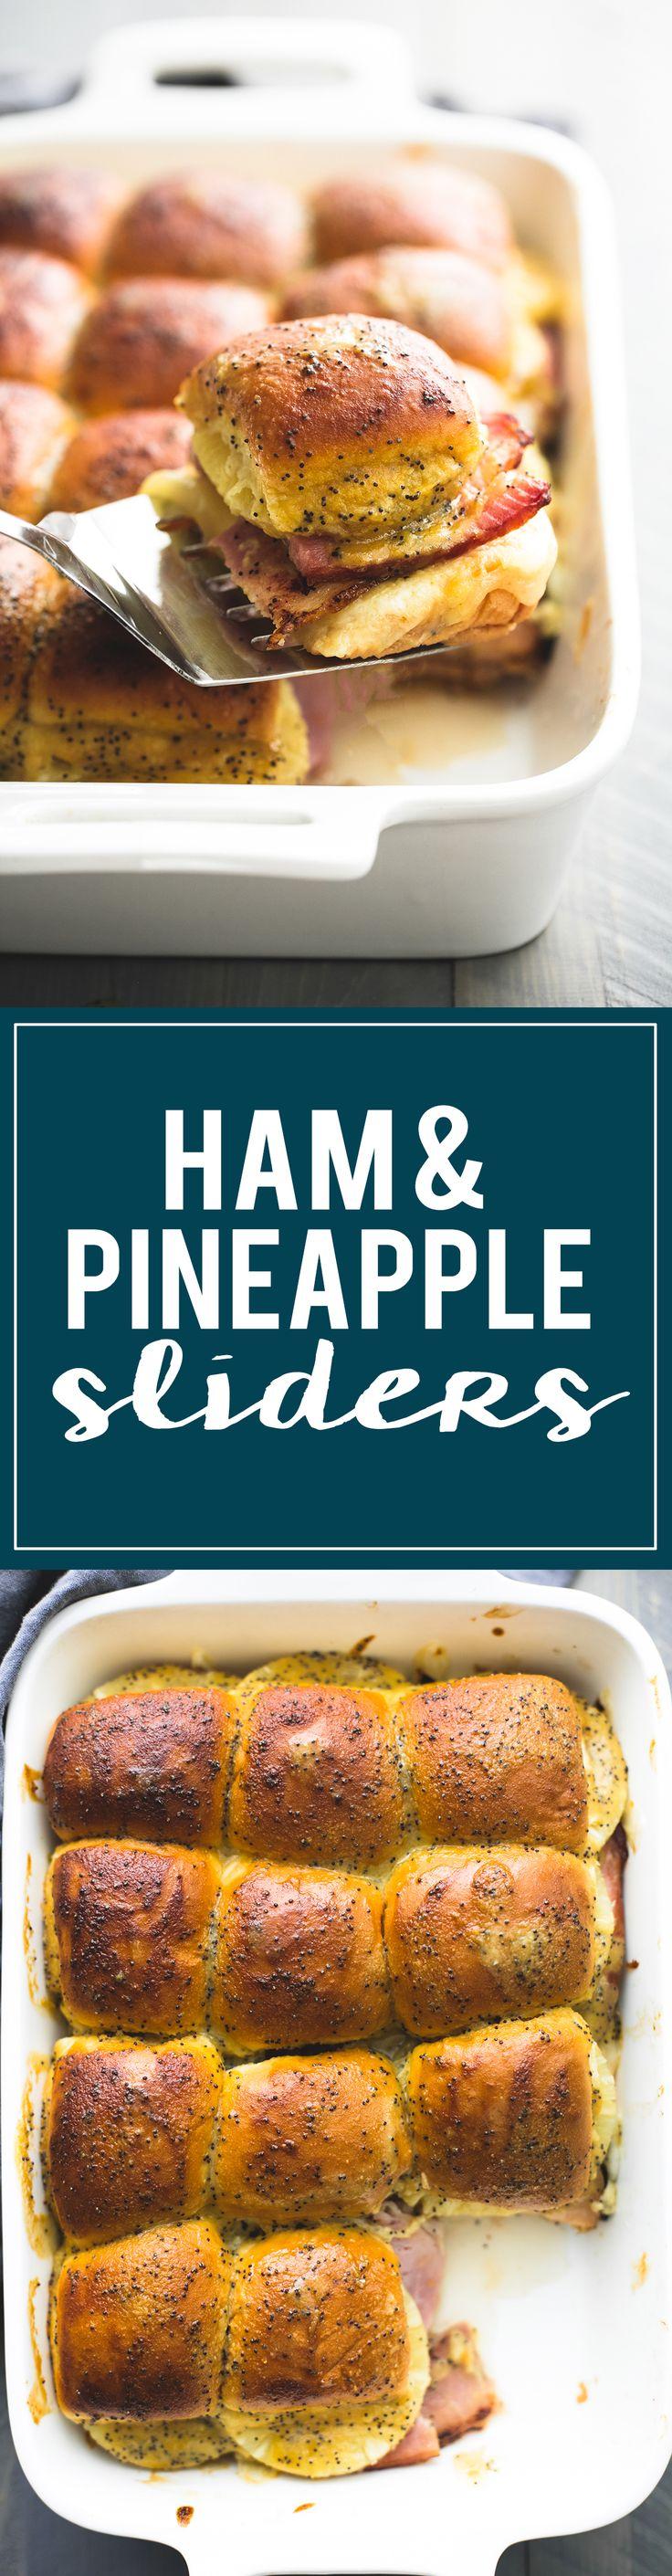 Hot Hawaiian Ham & Swiss Cheese Sliders with pineapple and brown sugar dijon poppyseed sauce are seriously addictive!!! | lecremedelacrumb.com